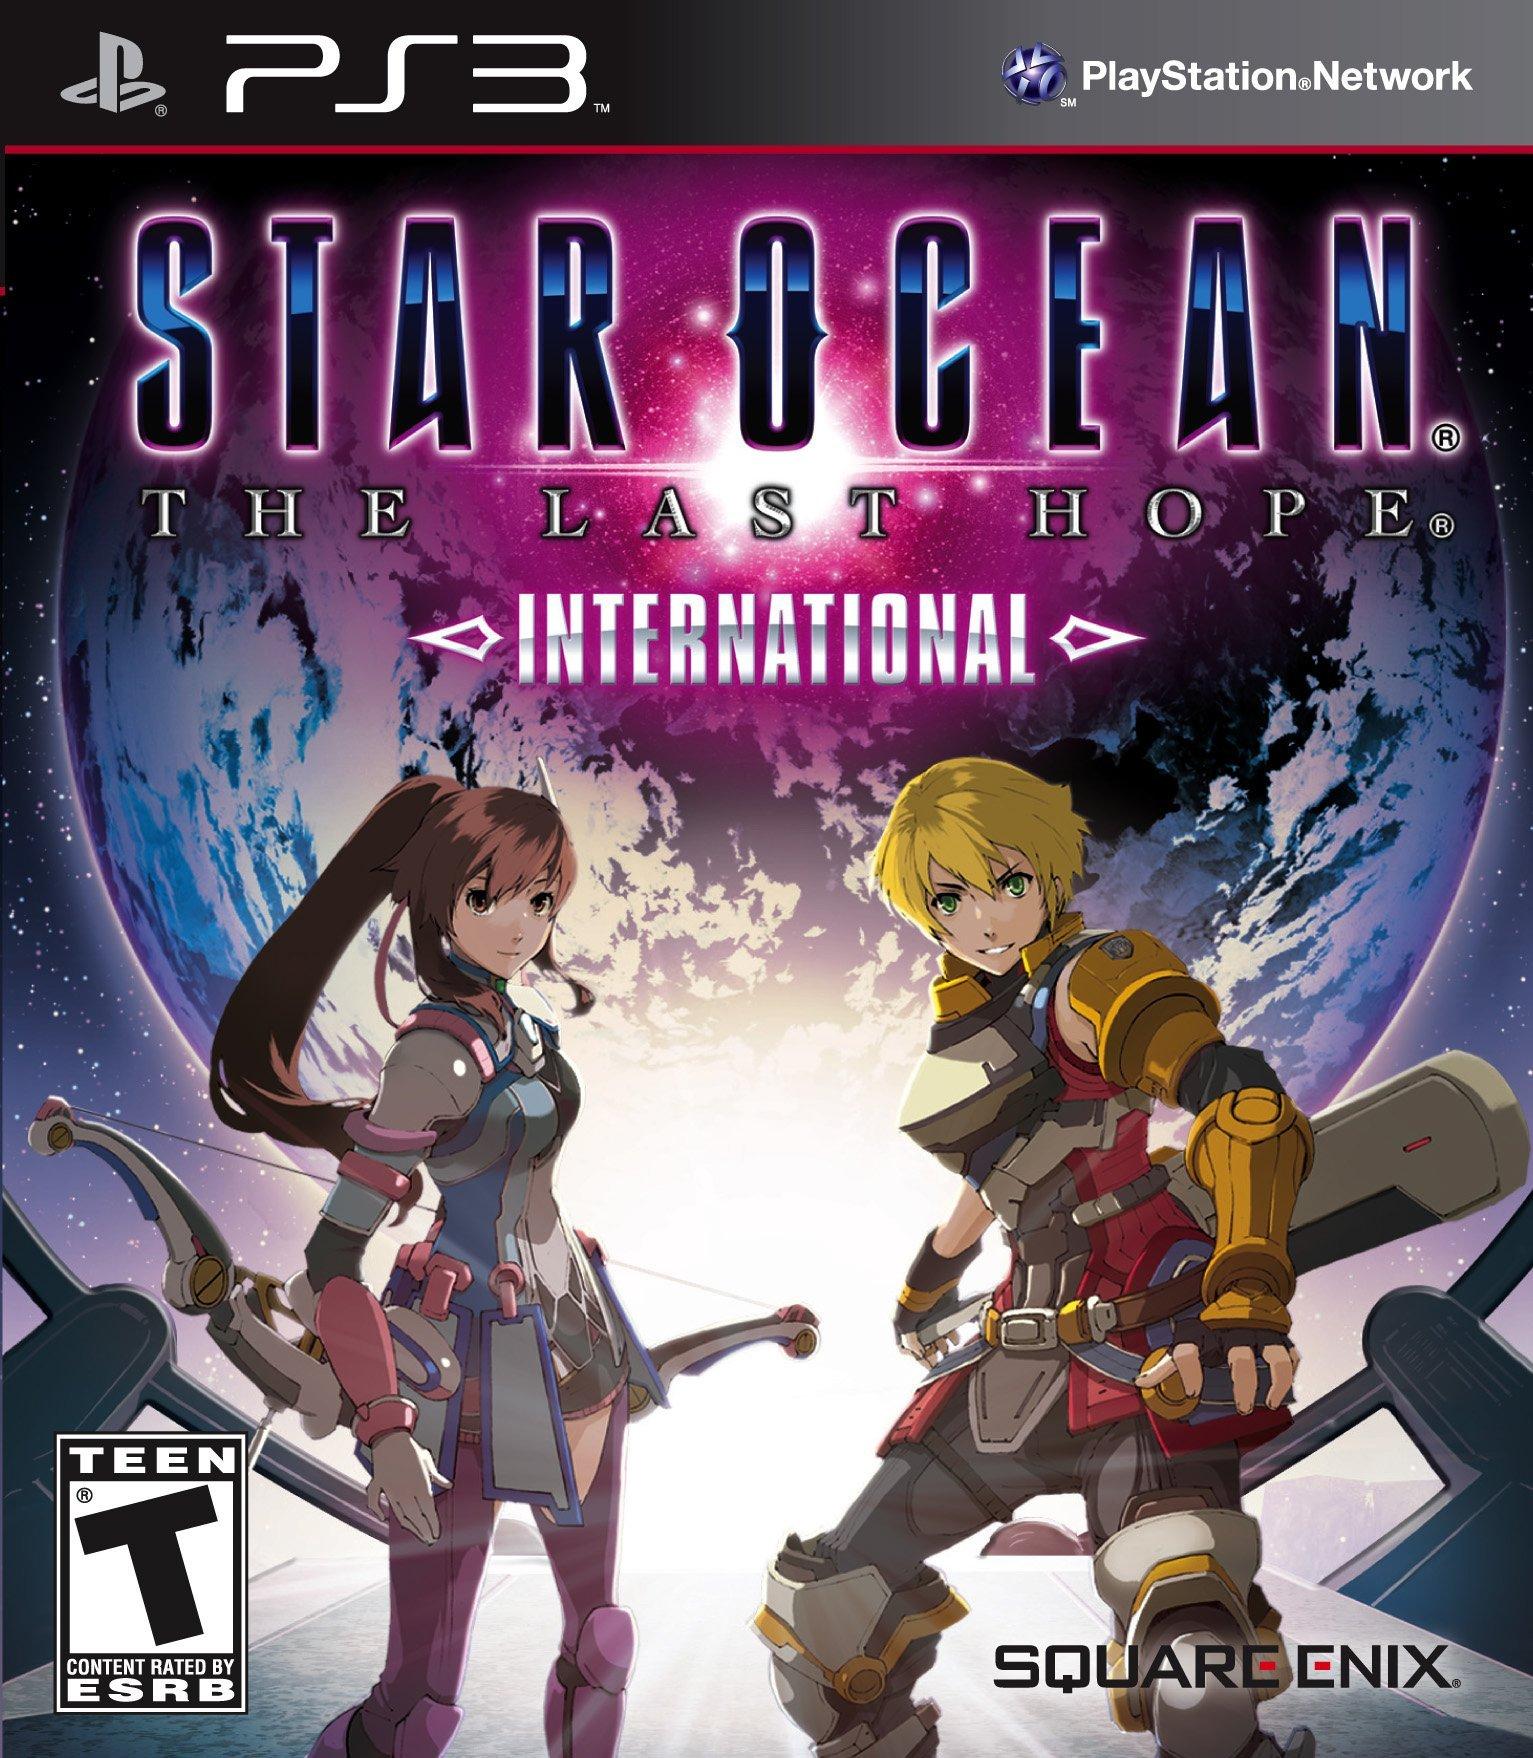 Star Ocean The Last Hope Ps3 Gets Anime Box Art Gematsu